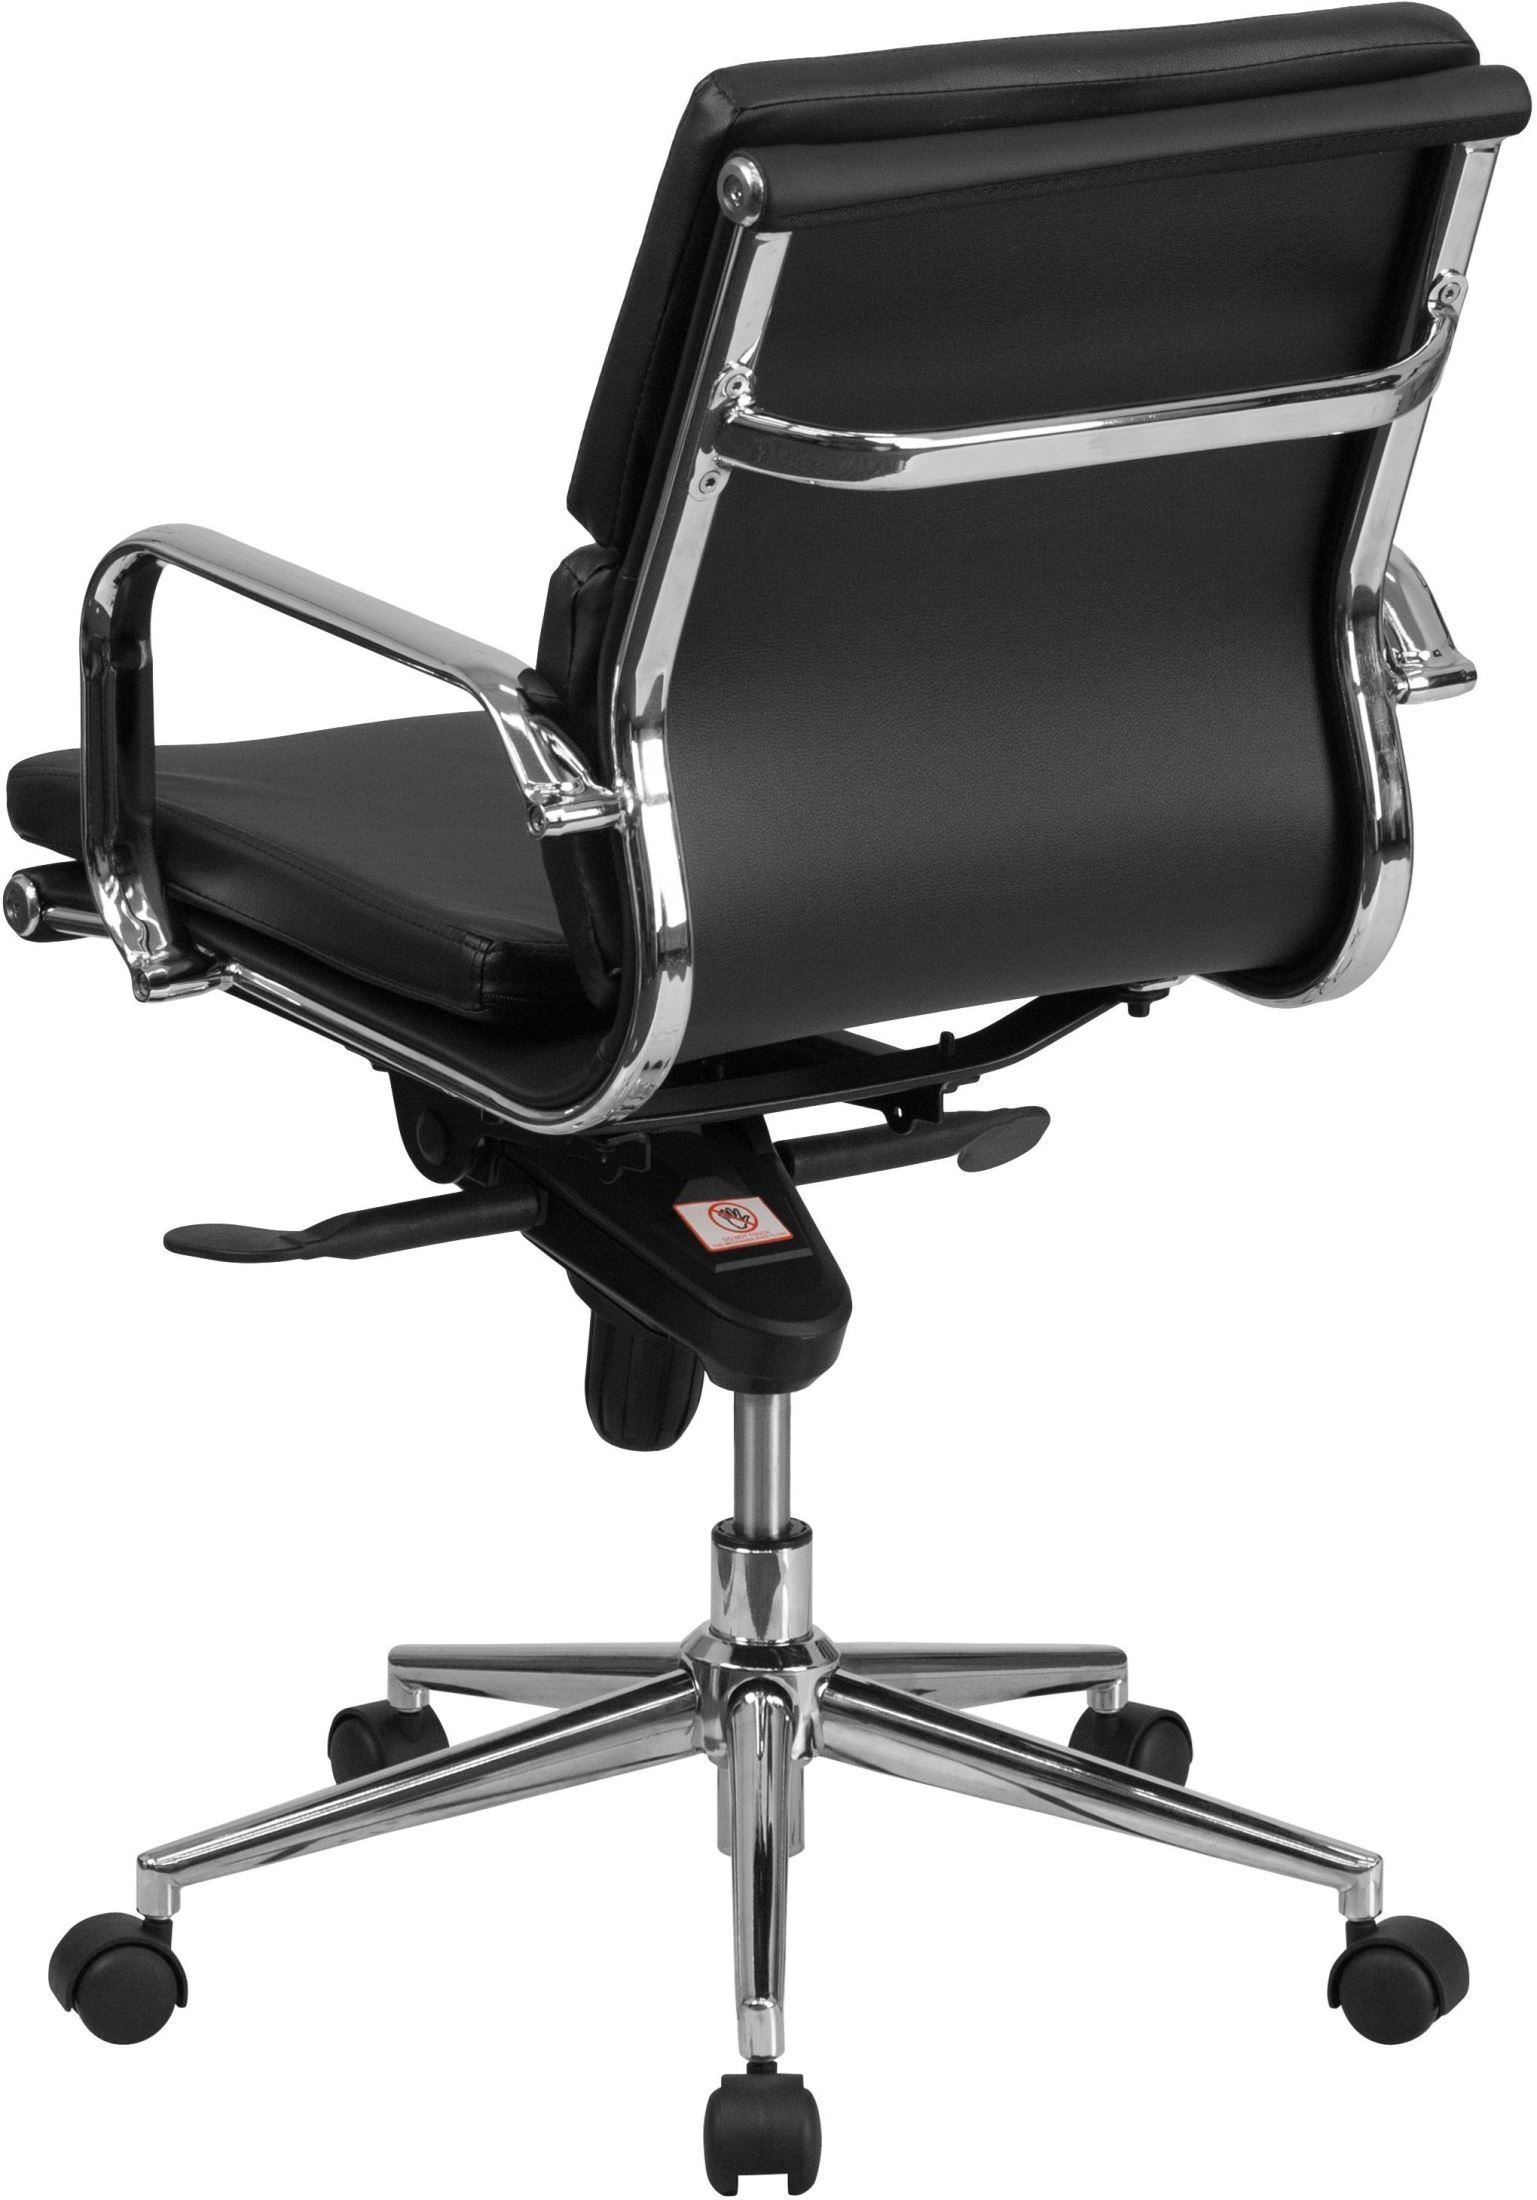 ergonomic chair tilt baby swing qatar mid back black leather executive swivel office with